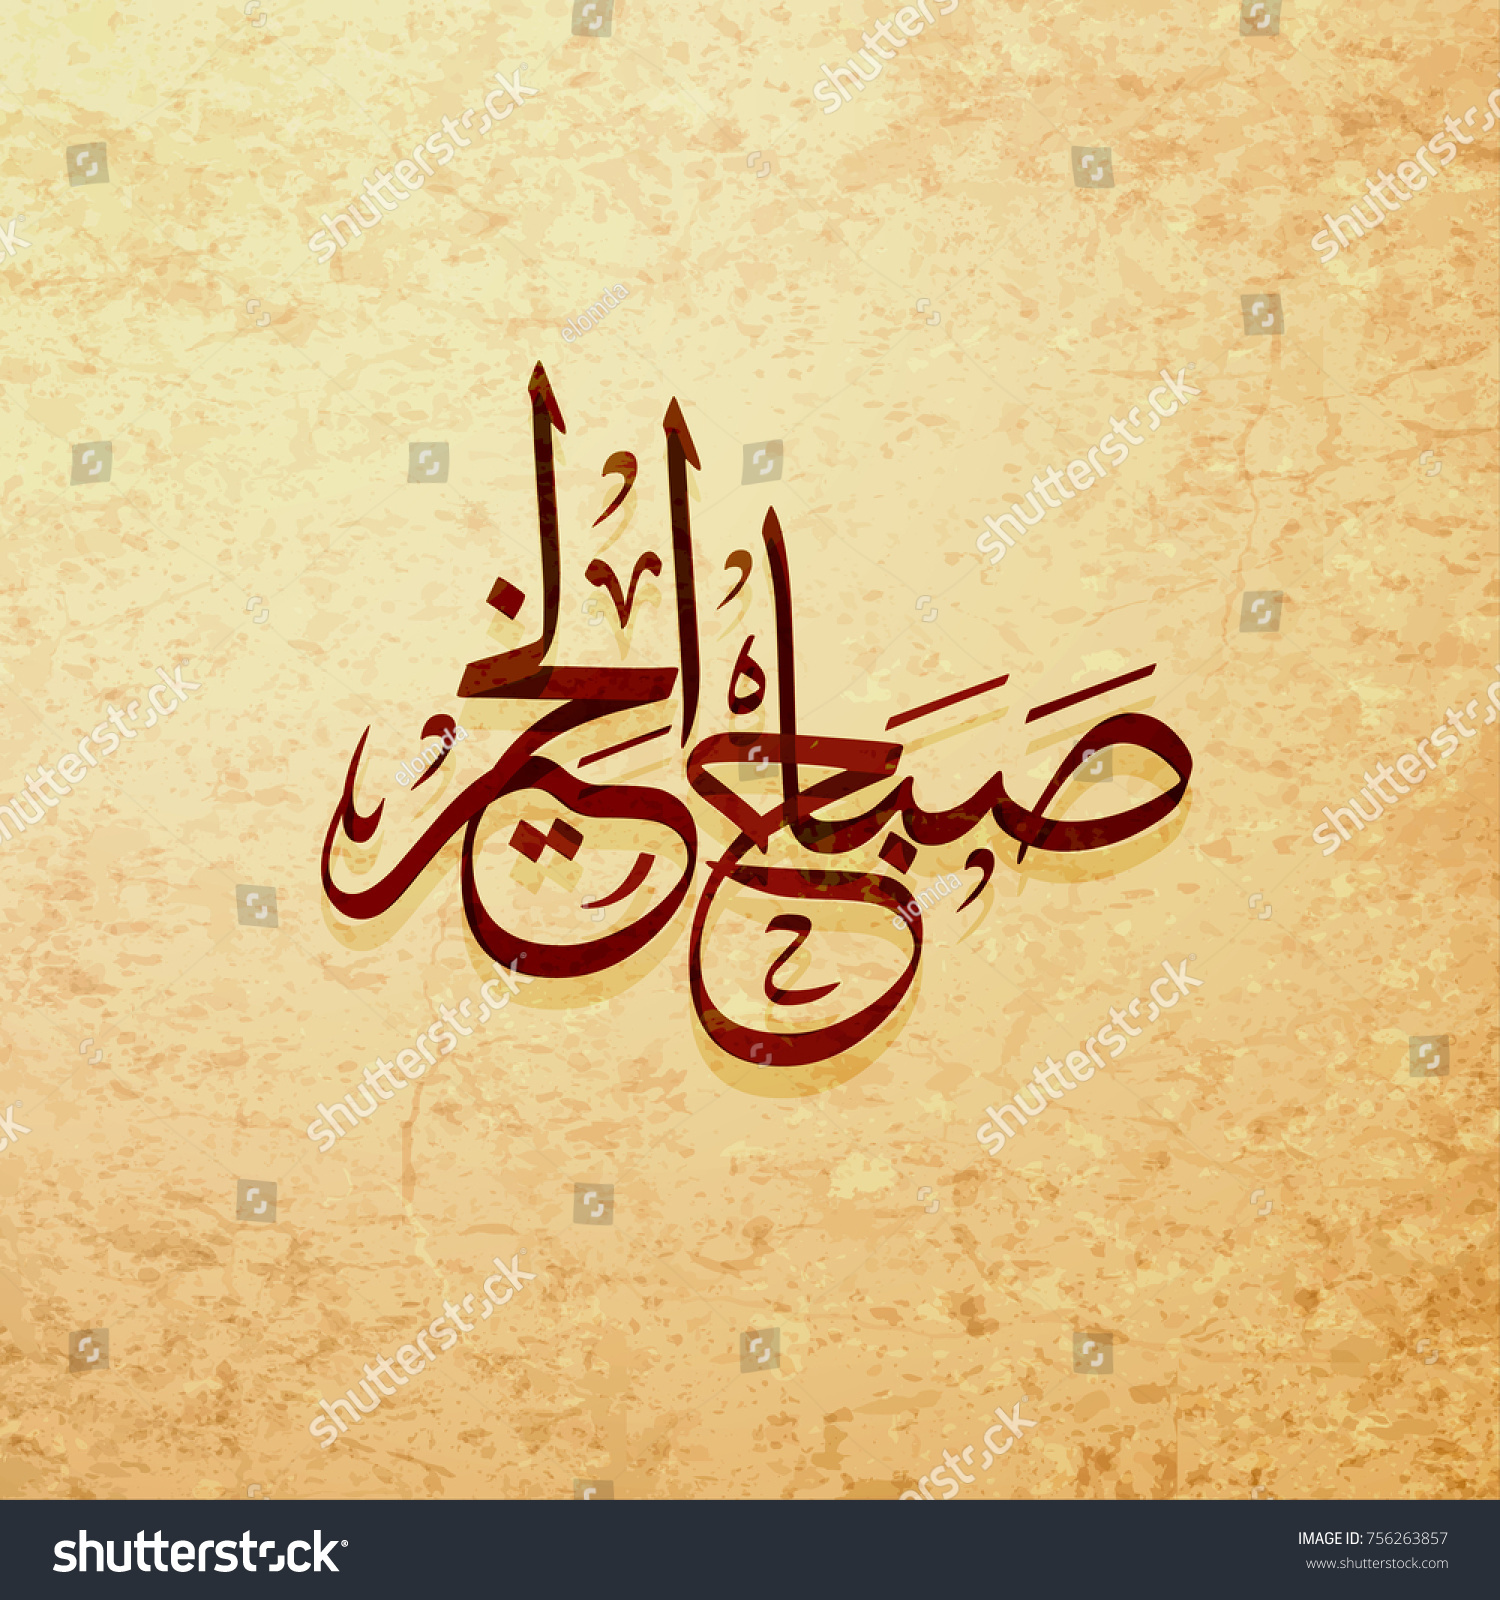 Arabic Islamic Calligraphy Good Morning Traditional Stock Vector ...